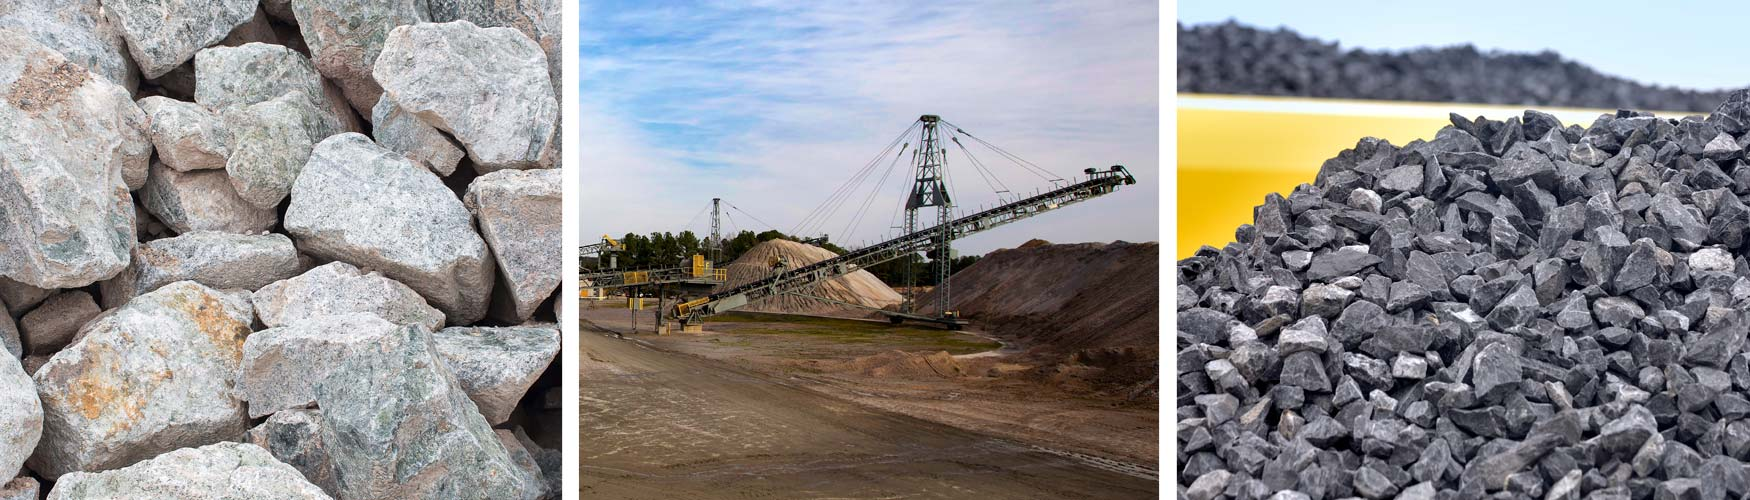 aggregate, Wake Stone Corporation